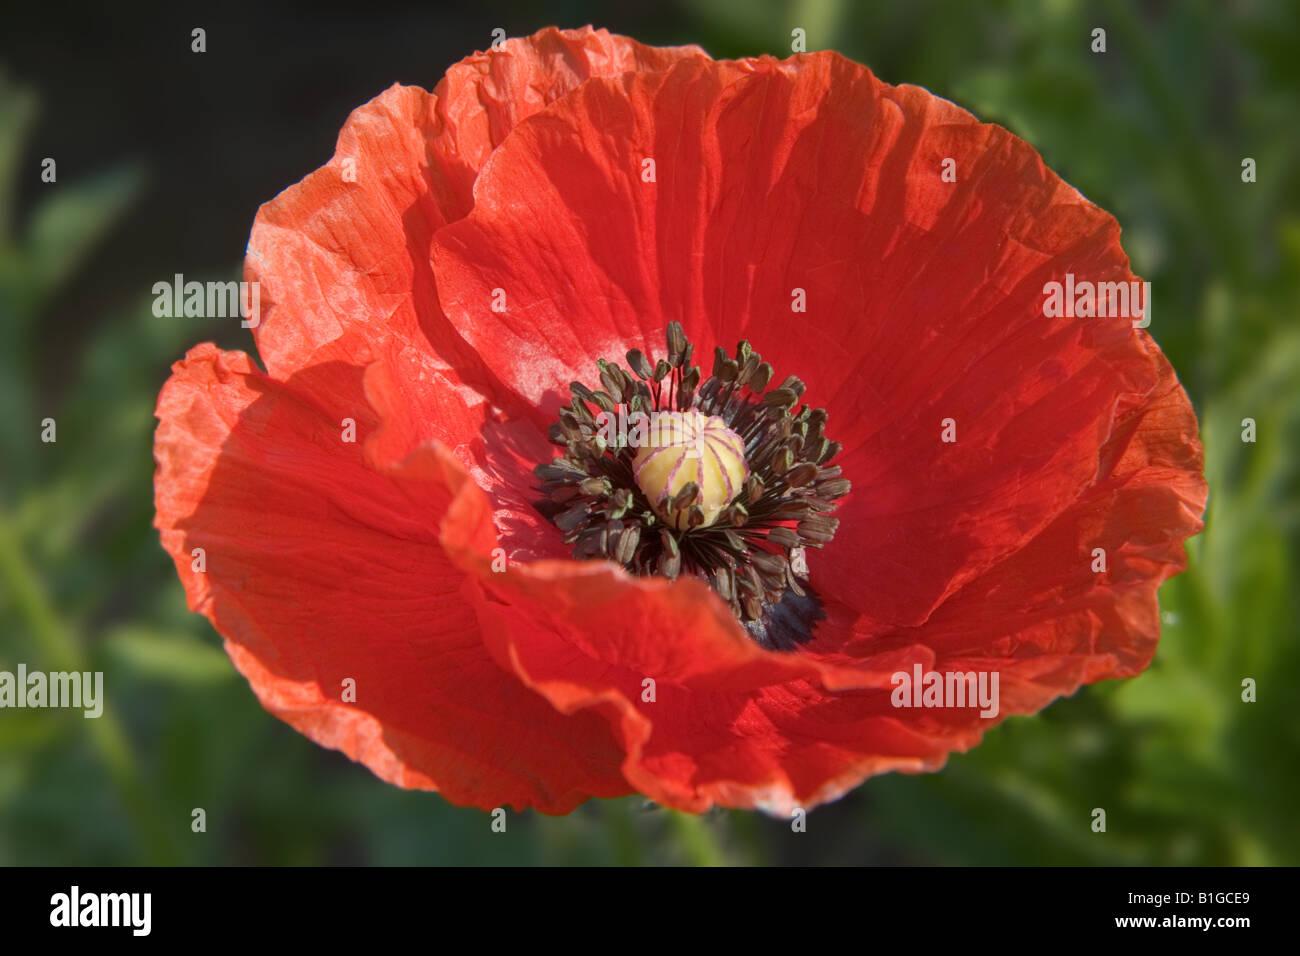 Poppy flower stock photos poppy flower stock images alamy red poppy flower stock image mightylinksfo